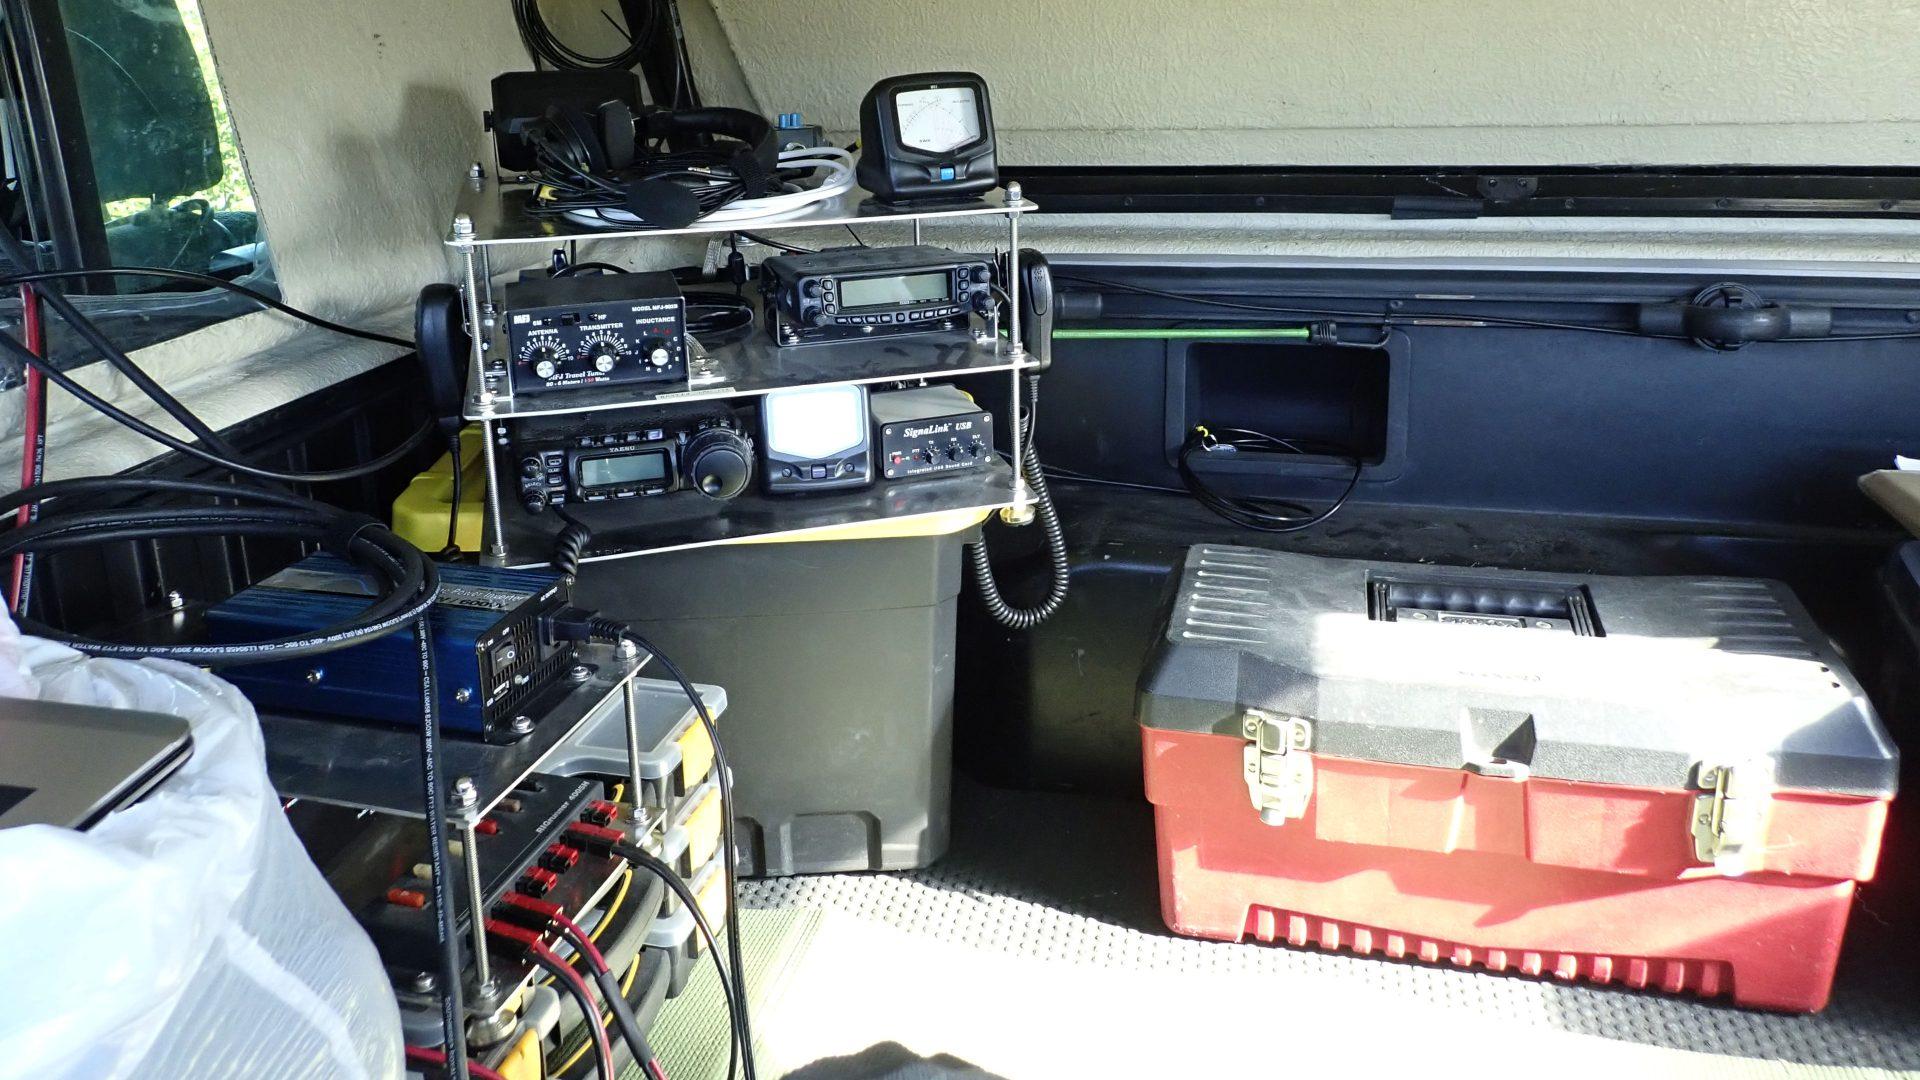 Ham radio rover station go-kit